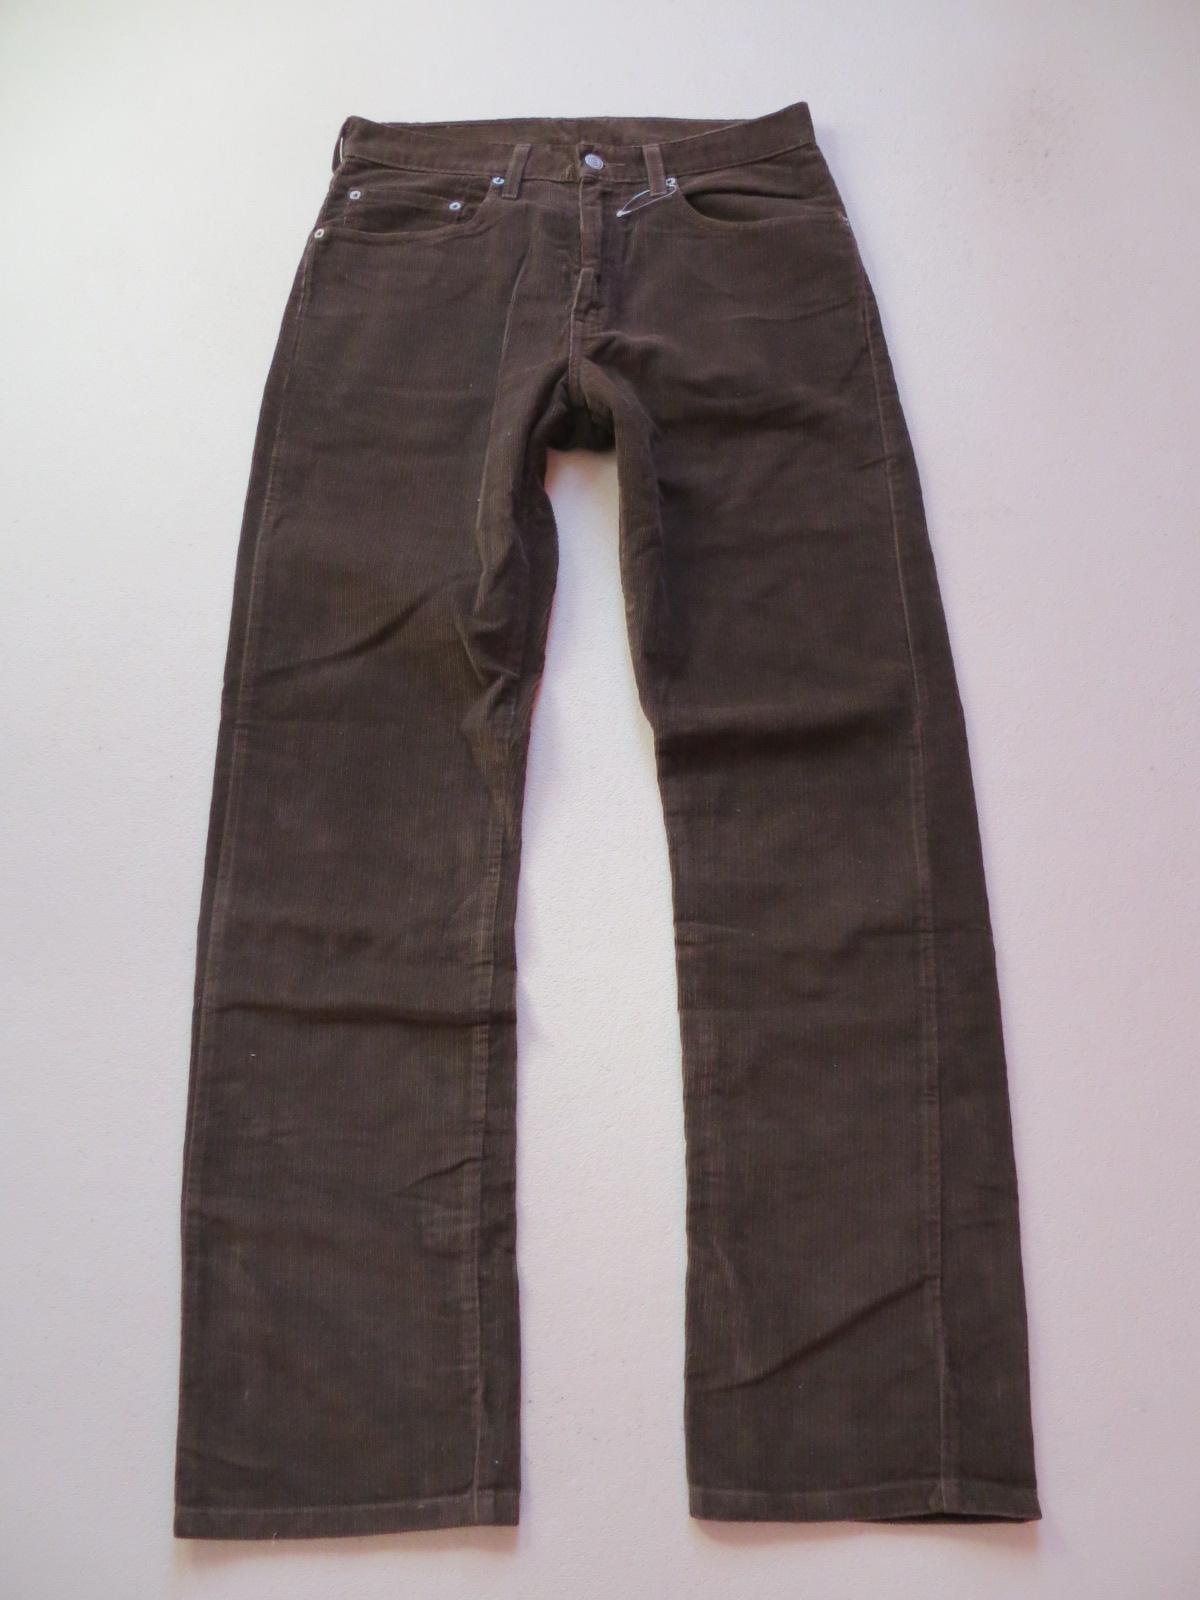 levi 39 s 505 cord jeans hose w 31 l 32 braun bequeme cordhose sehr gut 46. Black Bedroom Furniture Sets. Home Design Ideas